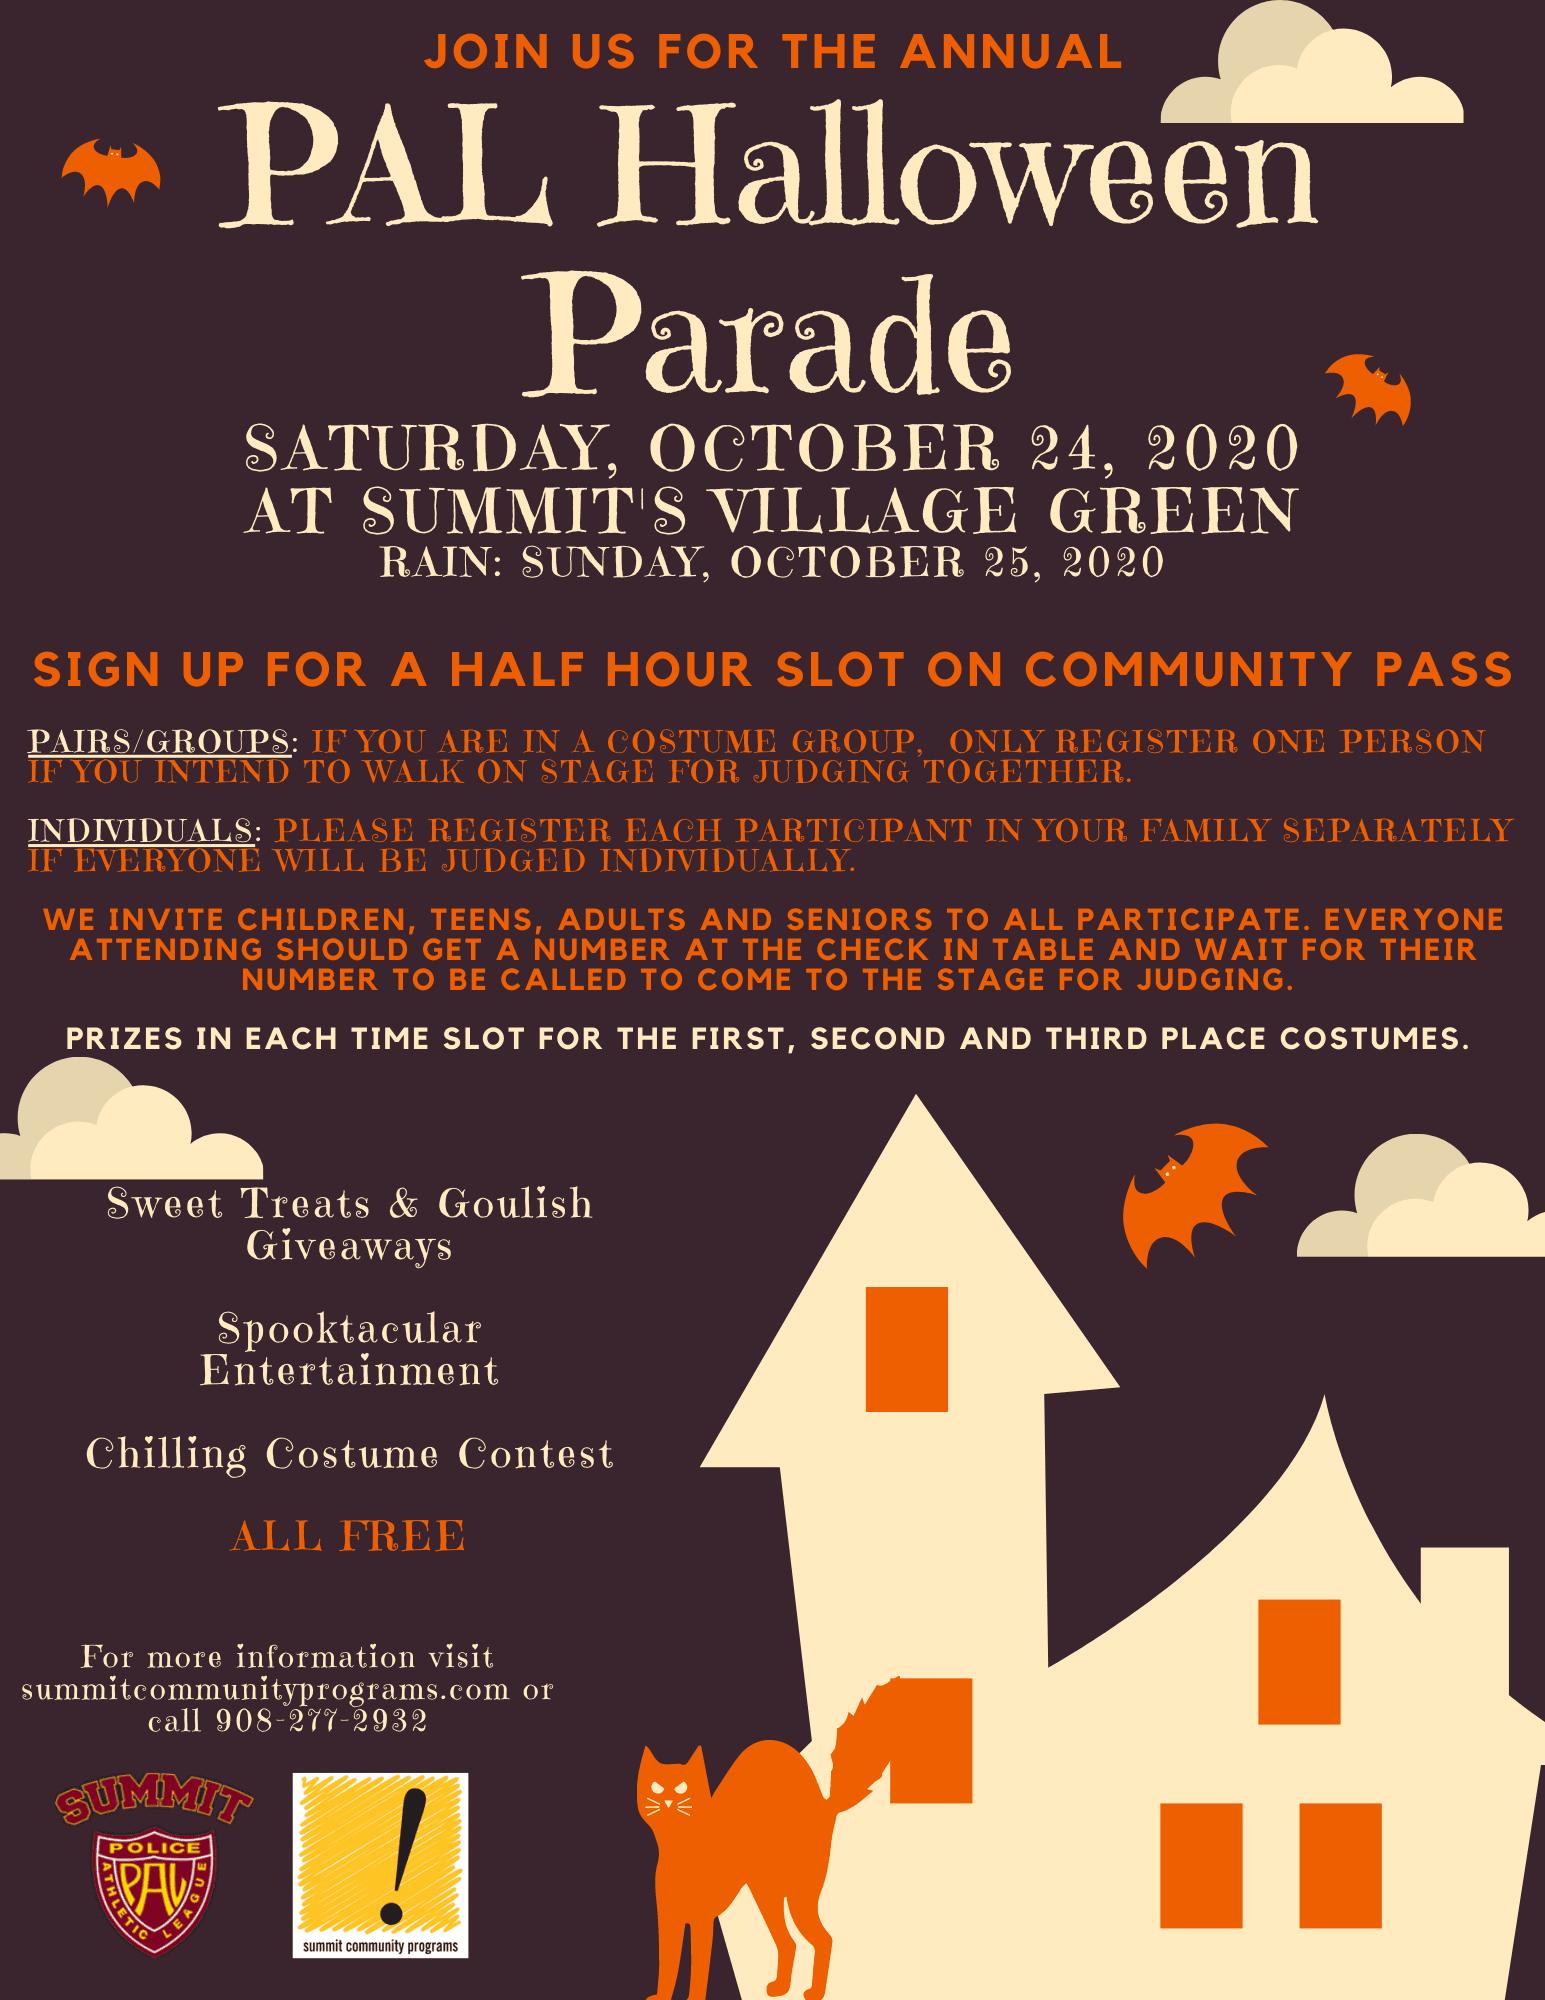 Pennsburg Halloween Parade 2020 PAL Halloween Parade | Summit Community Programs, NJ